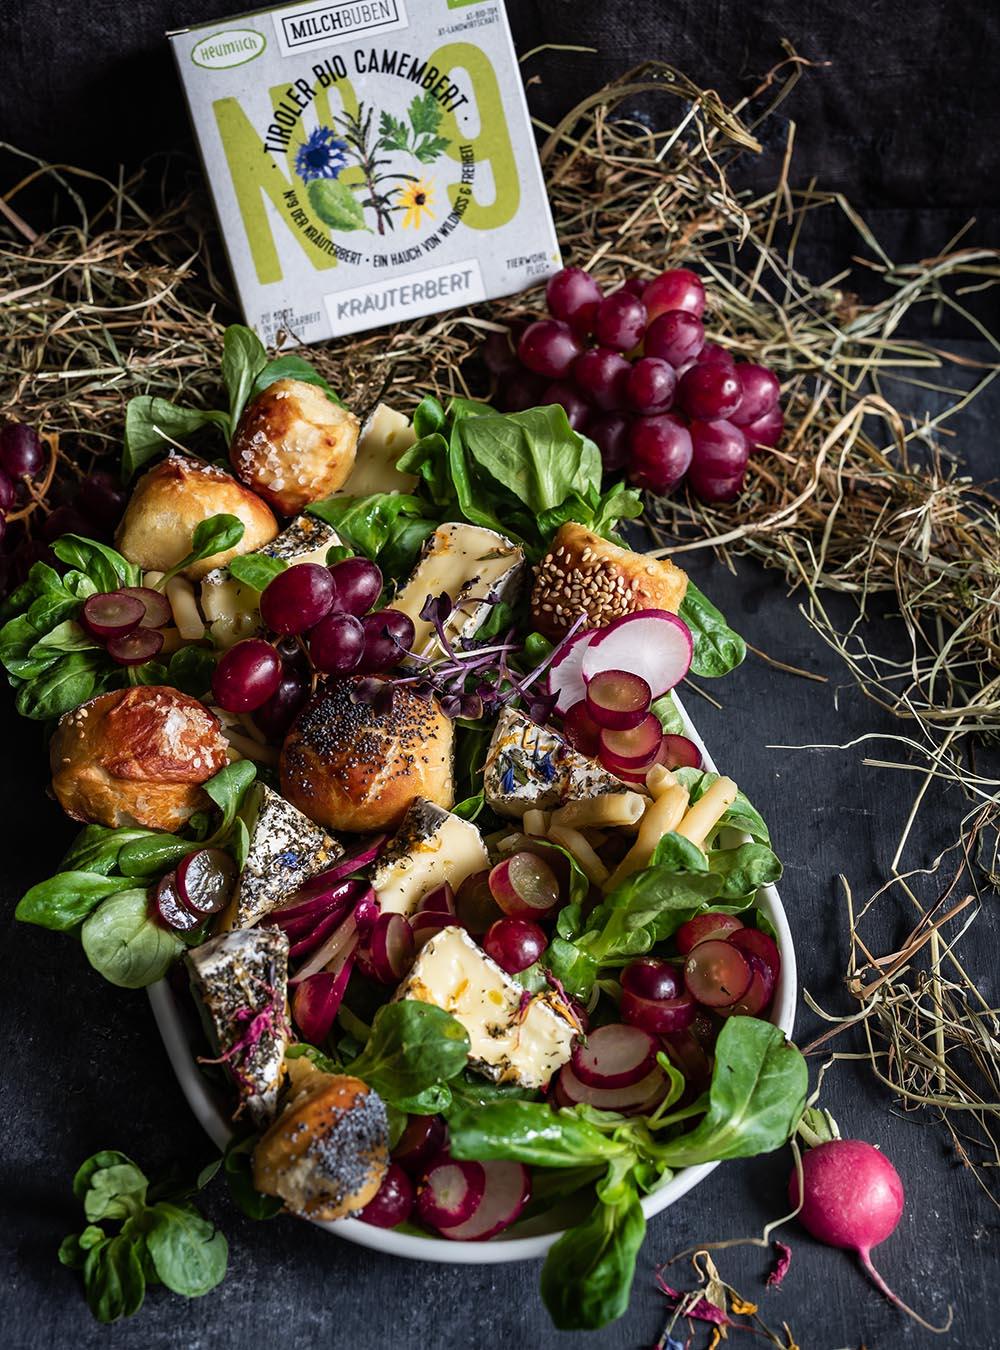 Heumilch Camembertsalat mit Aprikosendressing und Laugengebäck